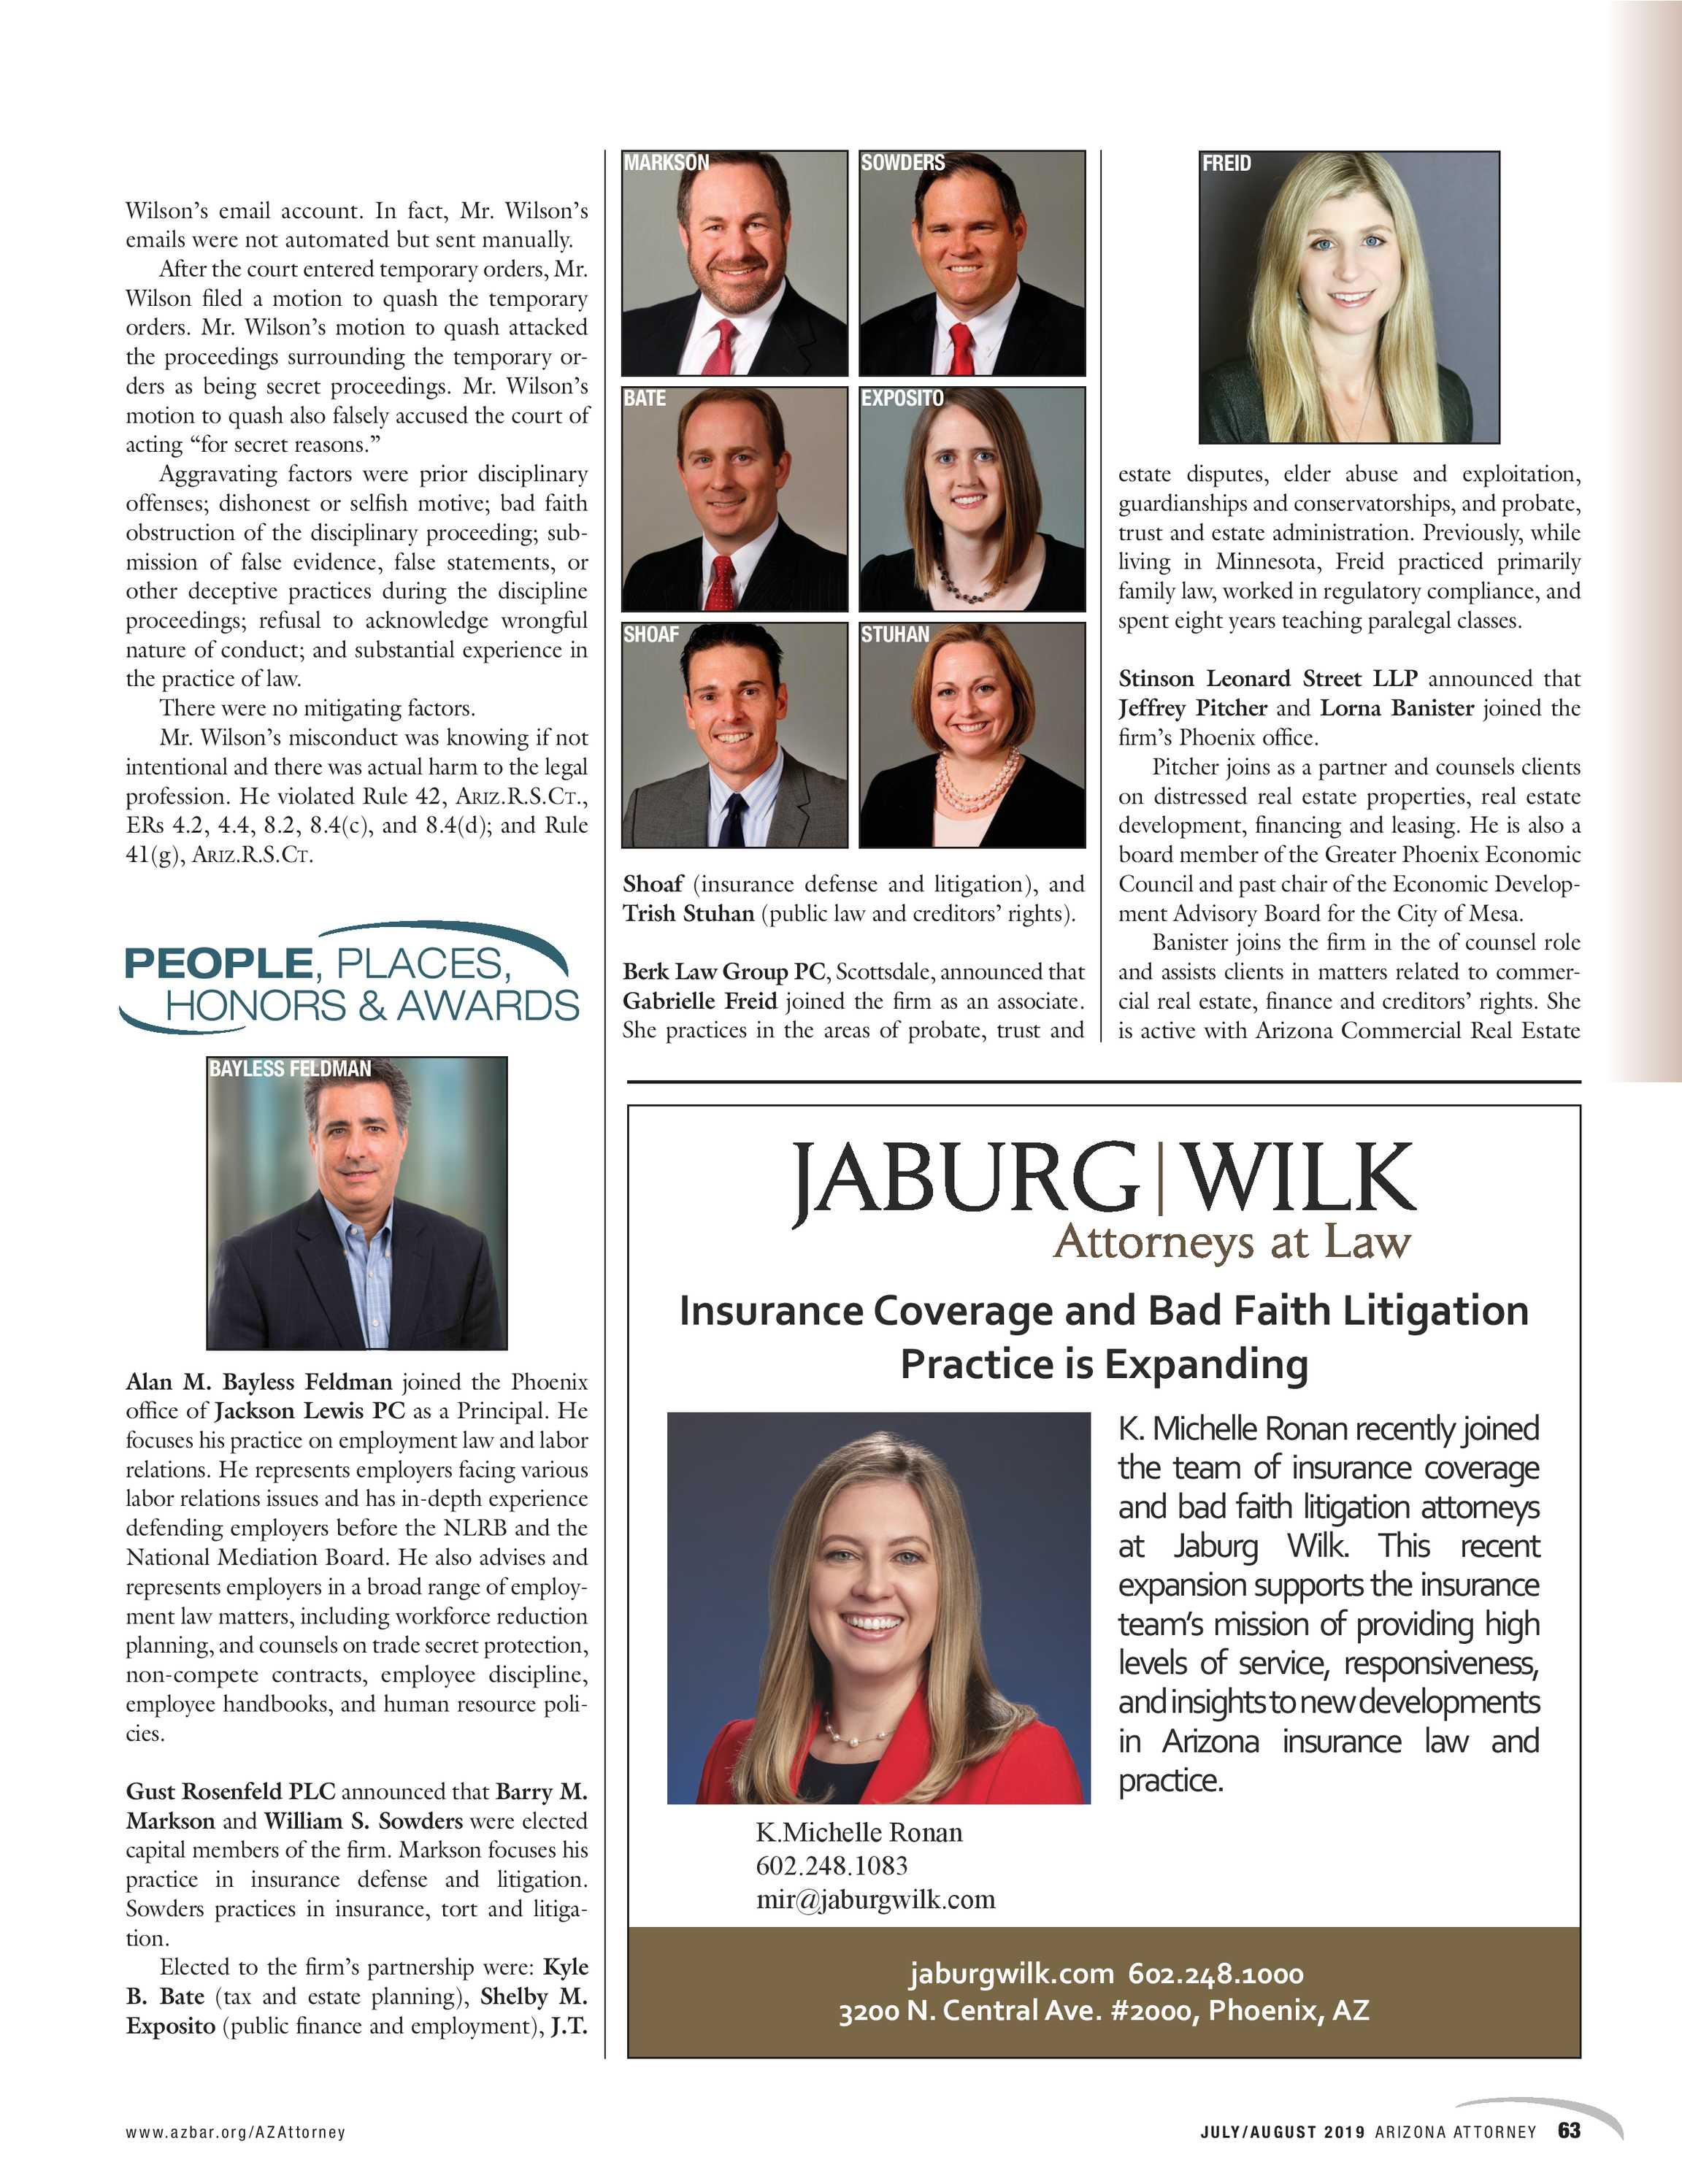 Arizona Attorney July August 2019 Page 63